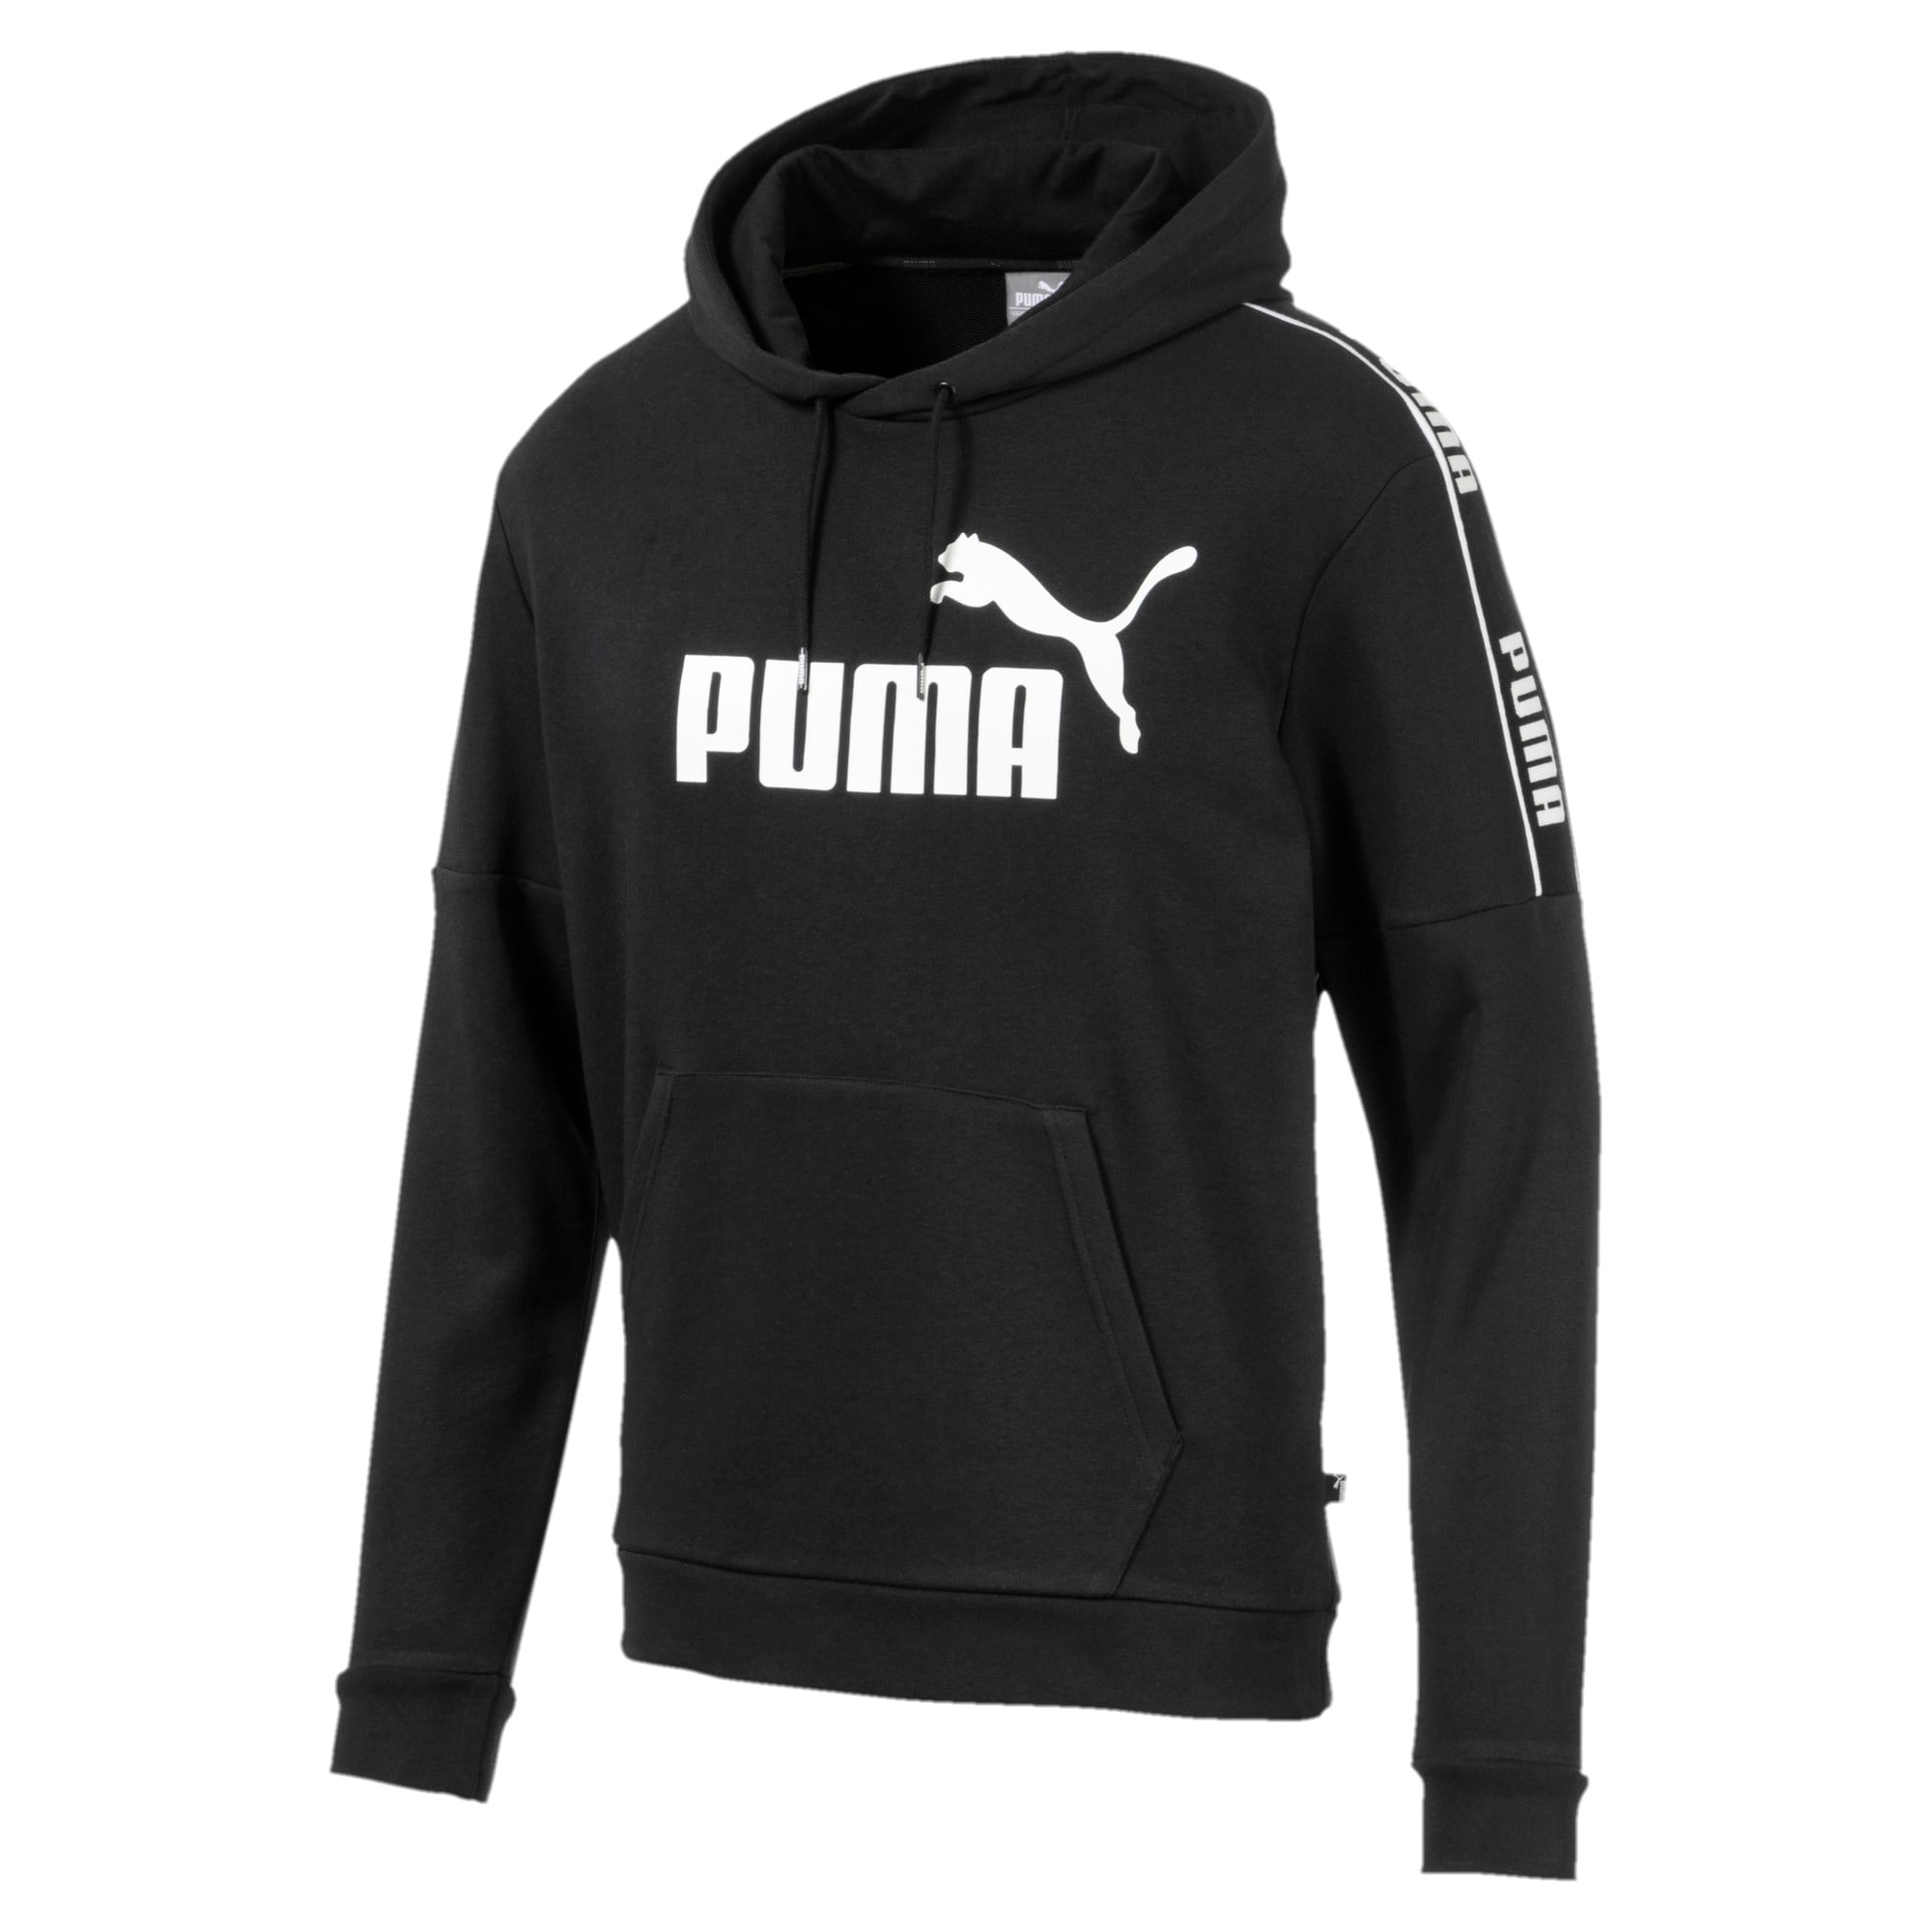 Miniatura 1 de Chaqueta con capucha Amplified para hombre, Puma Black, mediano